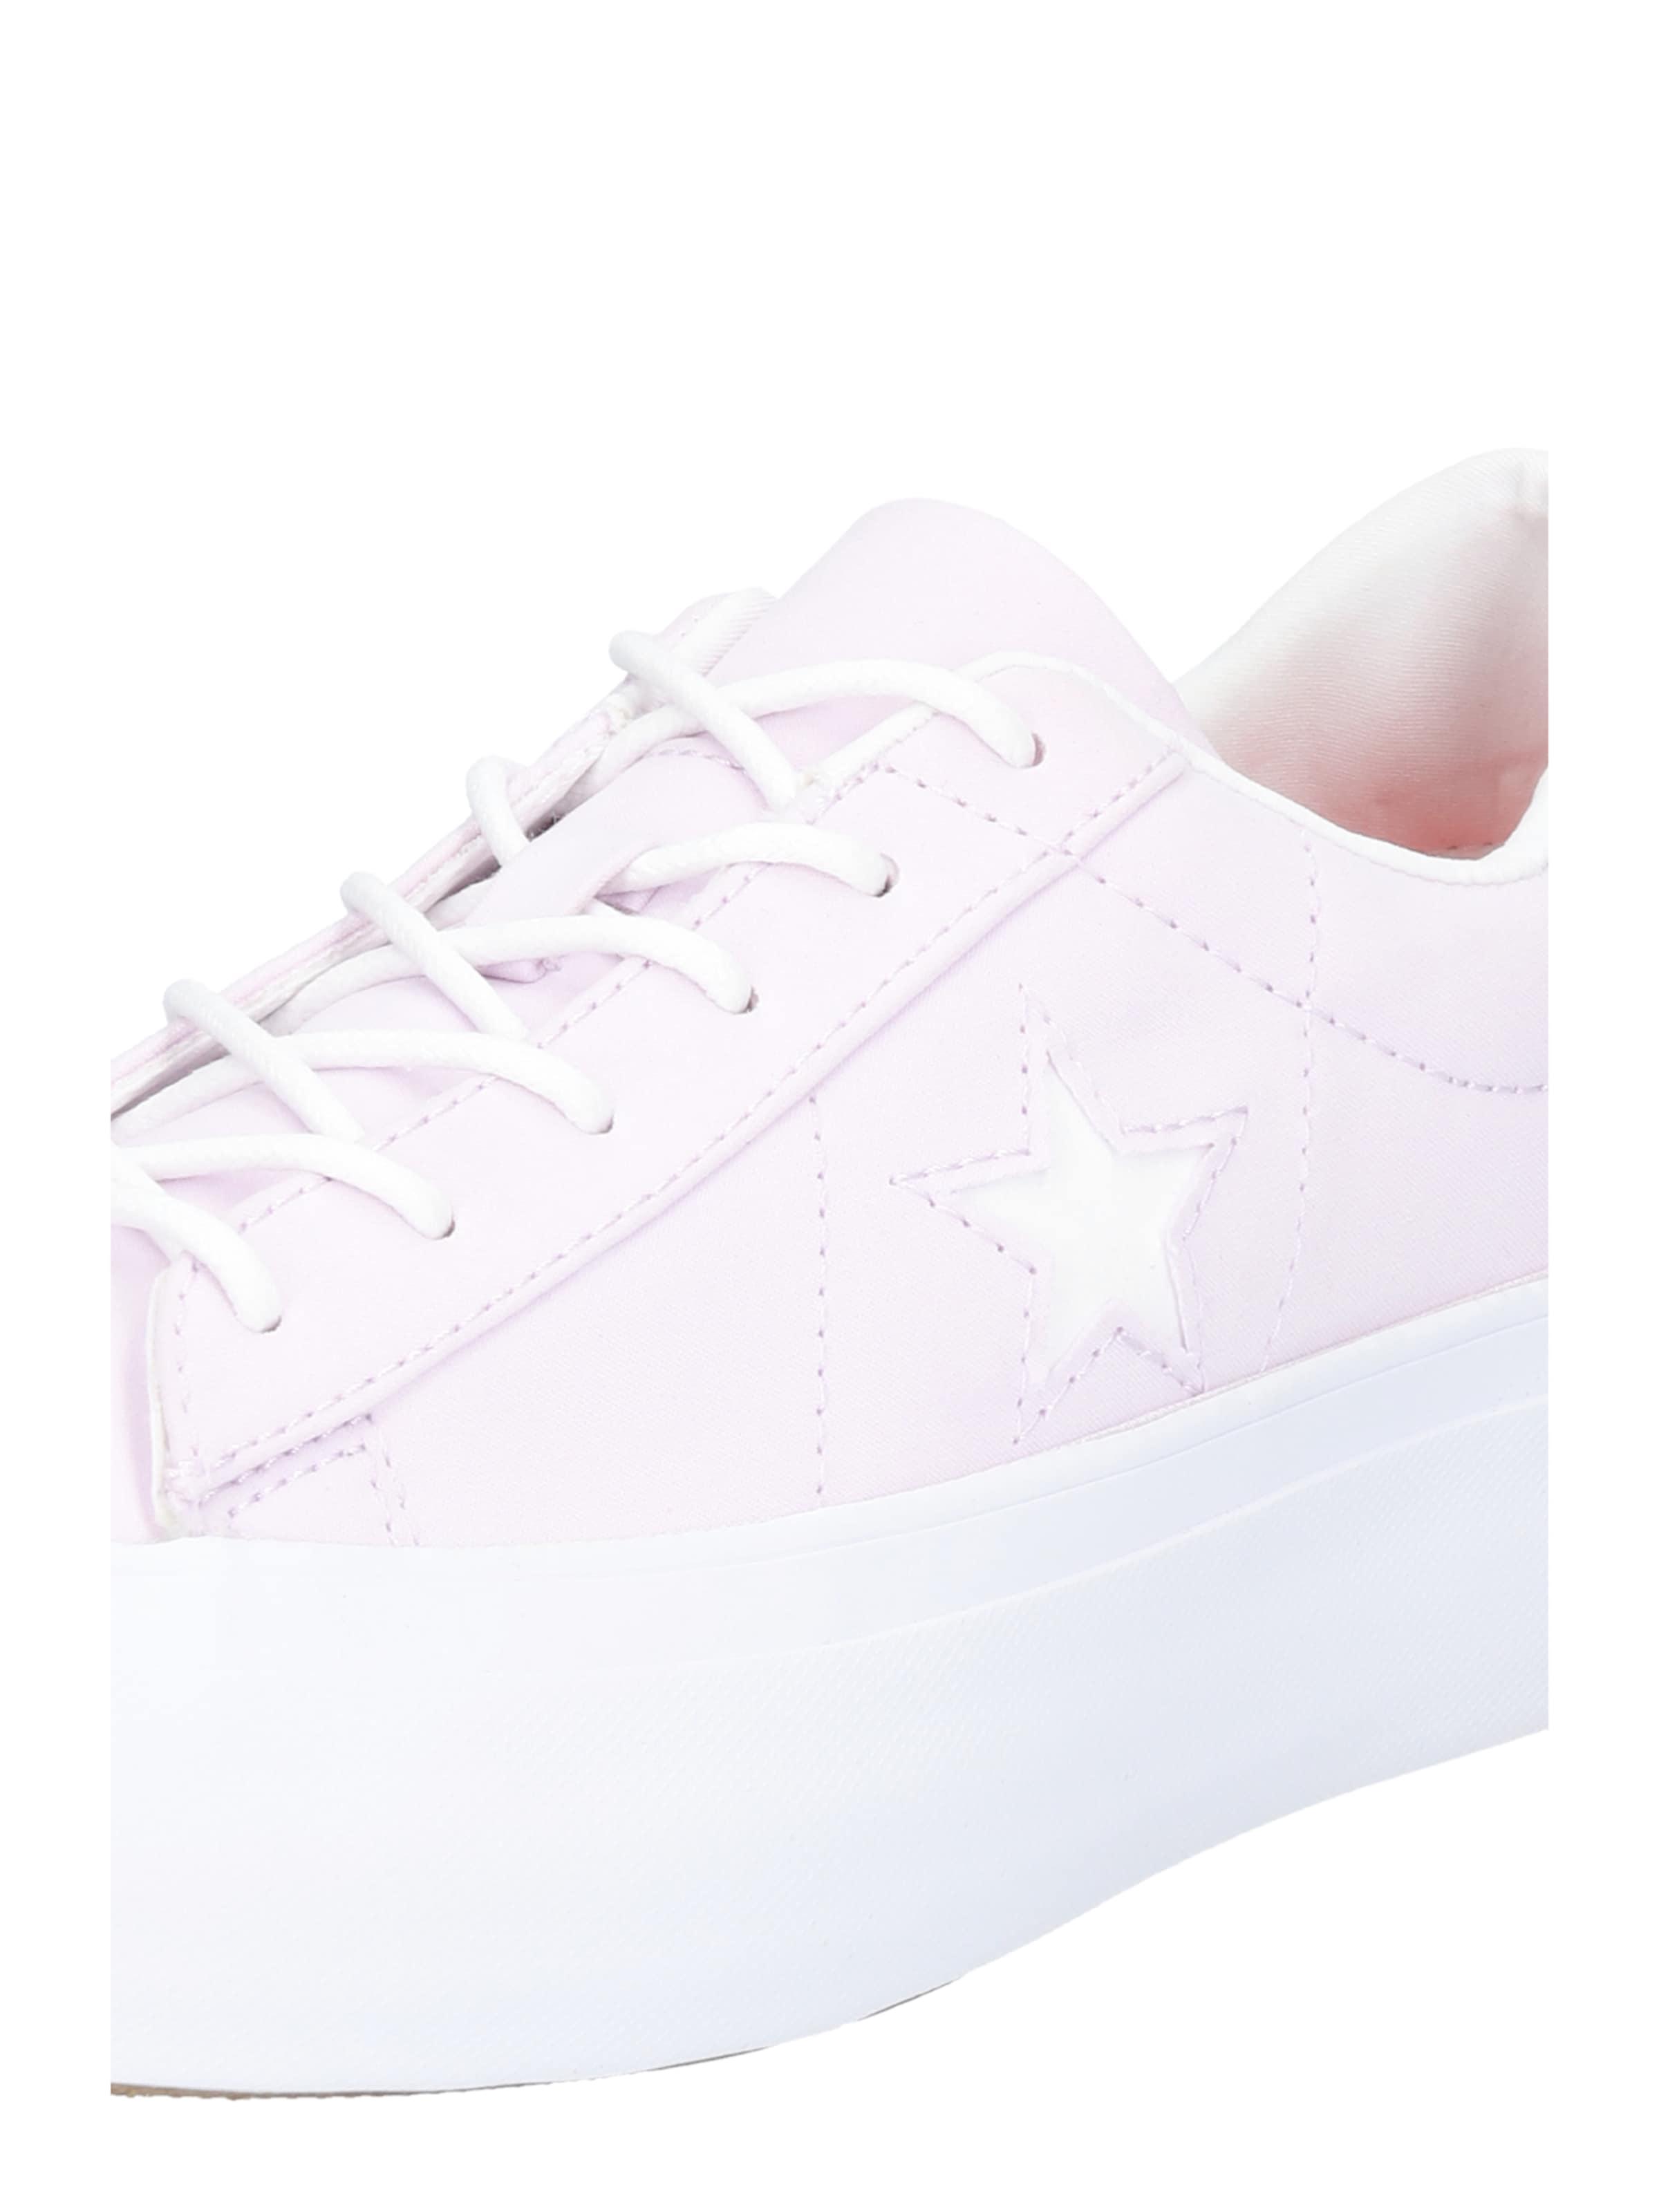 'one Basses En Converse PlatformOx' PastelFoncé Baskets Violet Star Blanc 1clFJuKT3